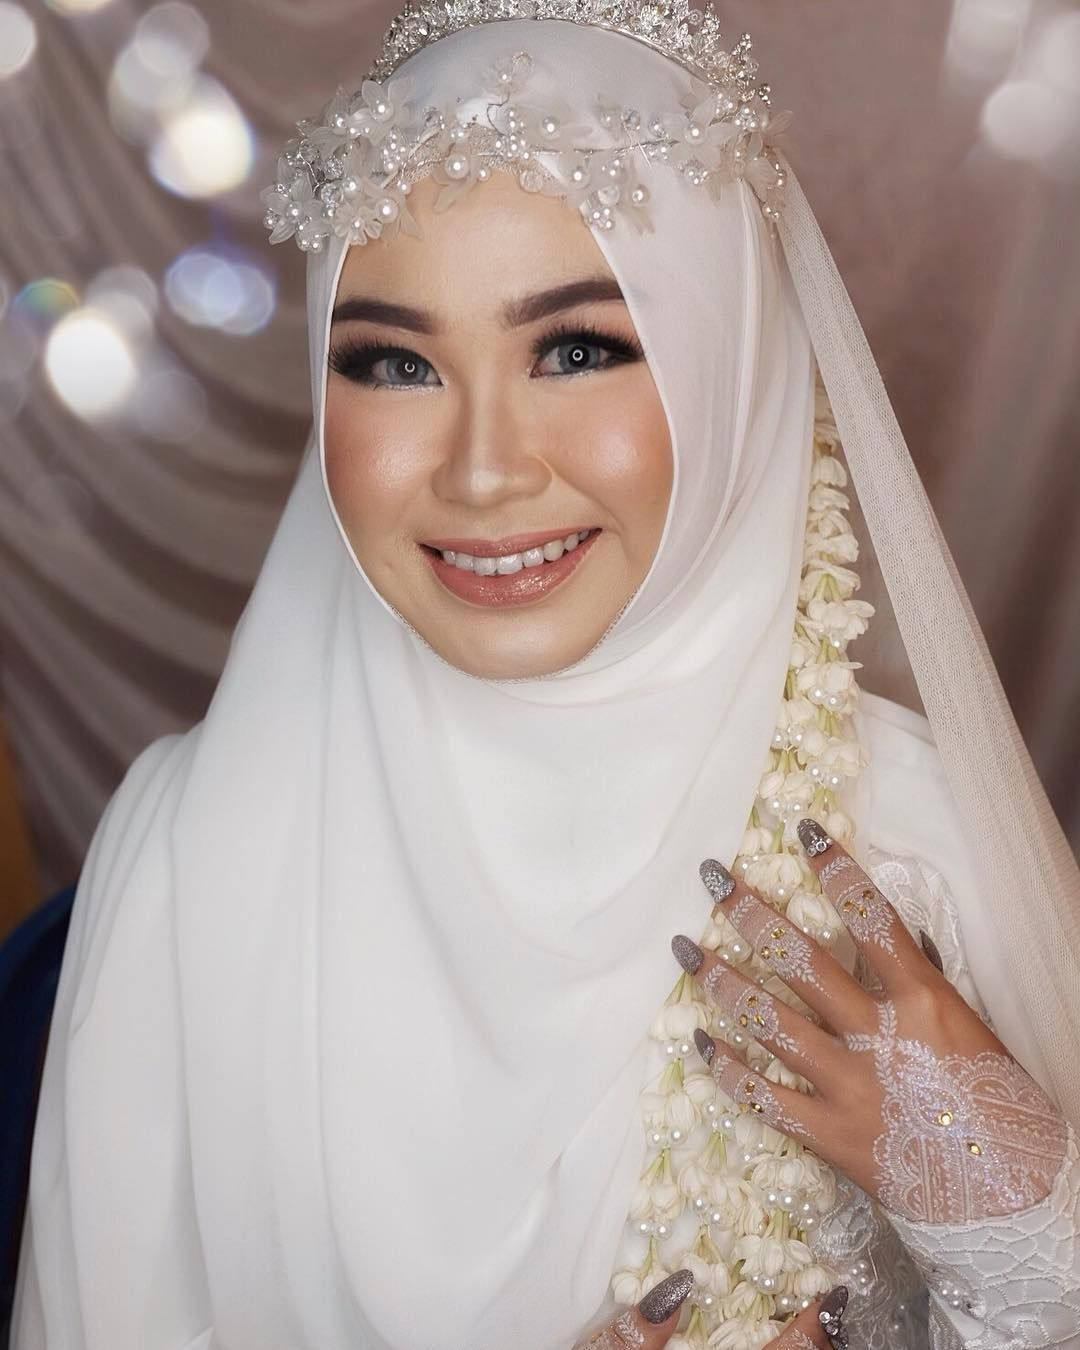 Akad Nikah Novi Makeup Gown Frizka Alam Hijab Style Wulanpuspitas Henna Art Akad Nikah Novi Mak Wedding Hijab Styles Nikah Dress Muslim Wedding Dresses